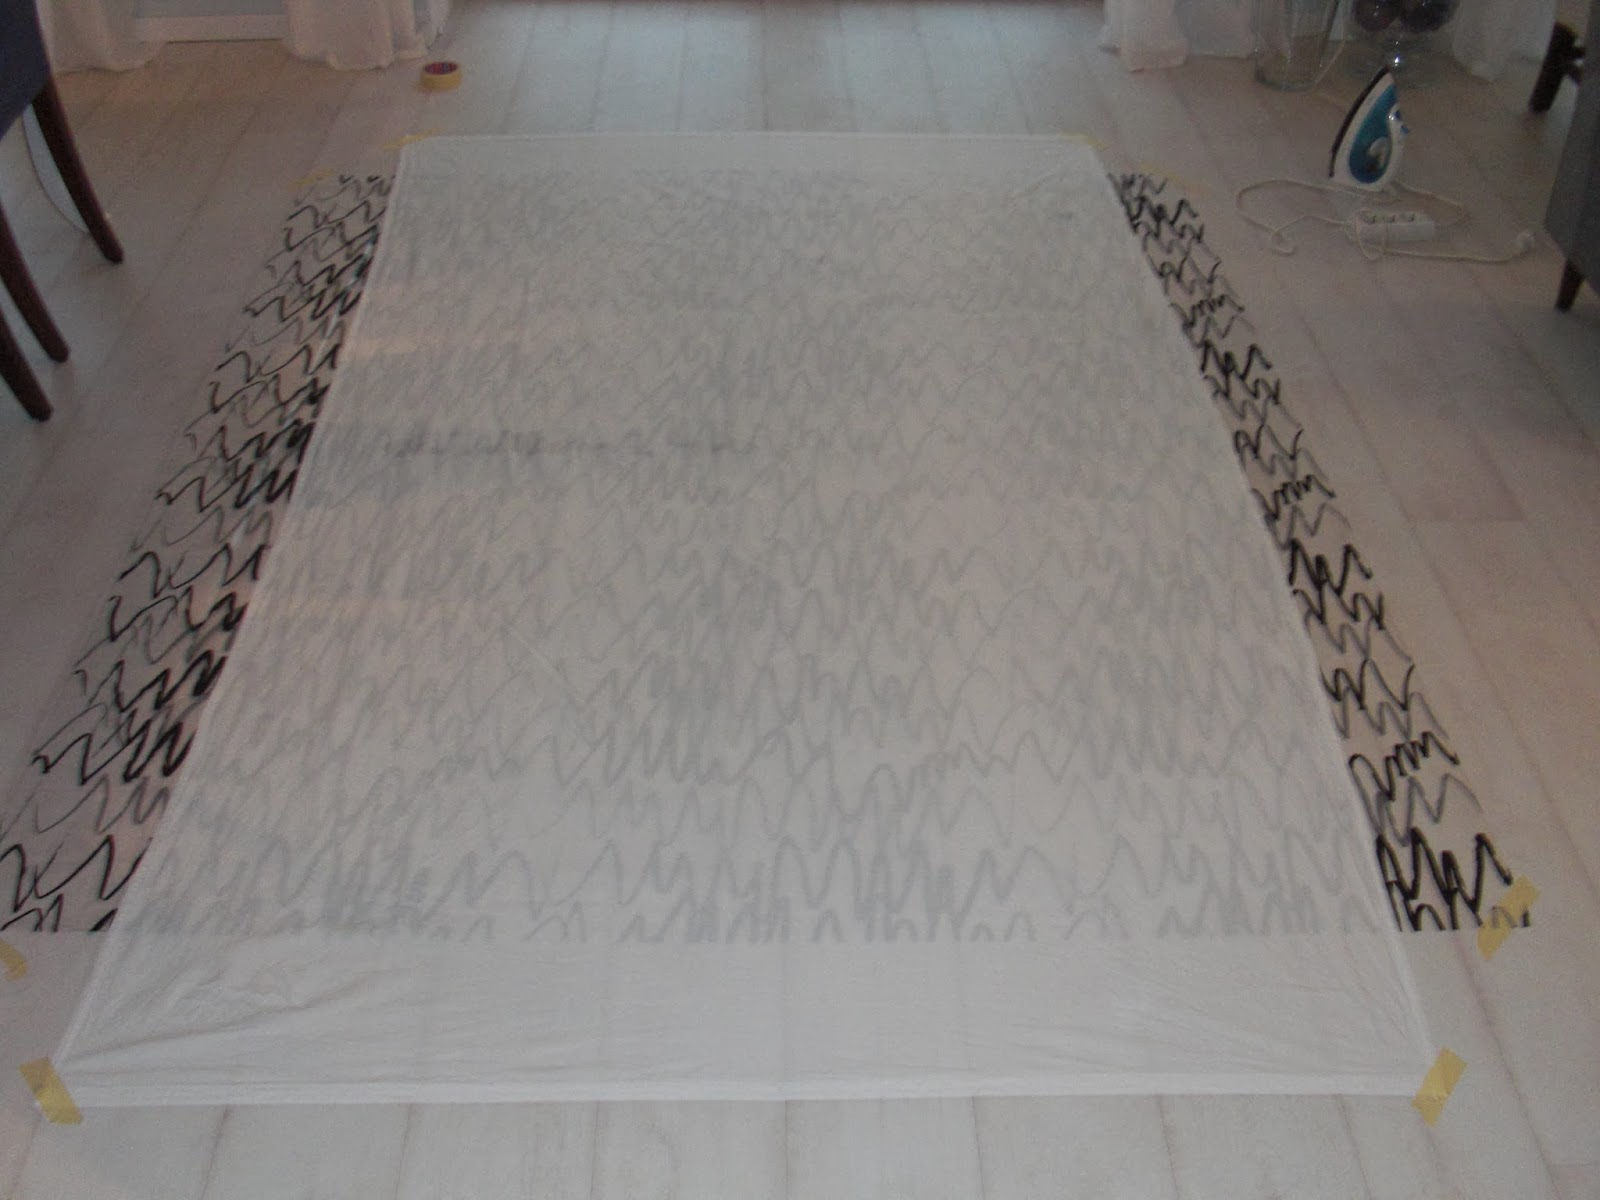 Ikea Duschvorhang : Vorbereitung+Malzone+mit+ikea+Duschvorhang.JPG